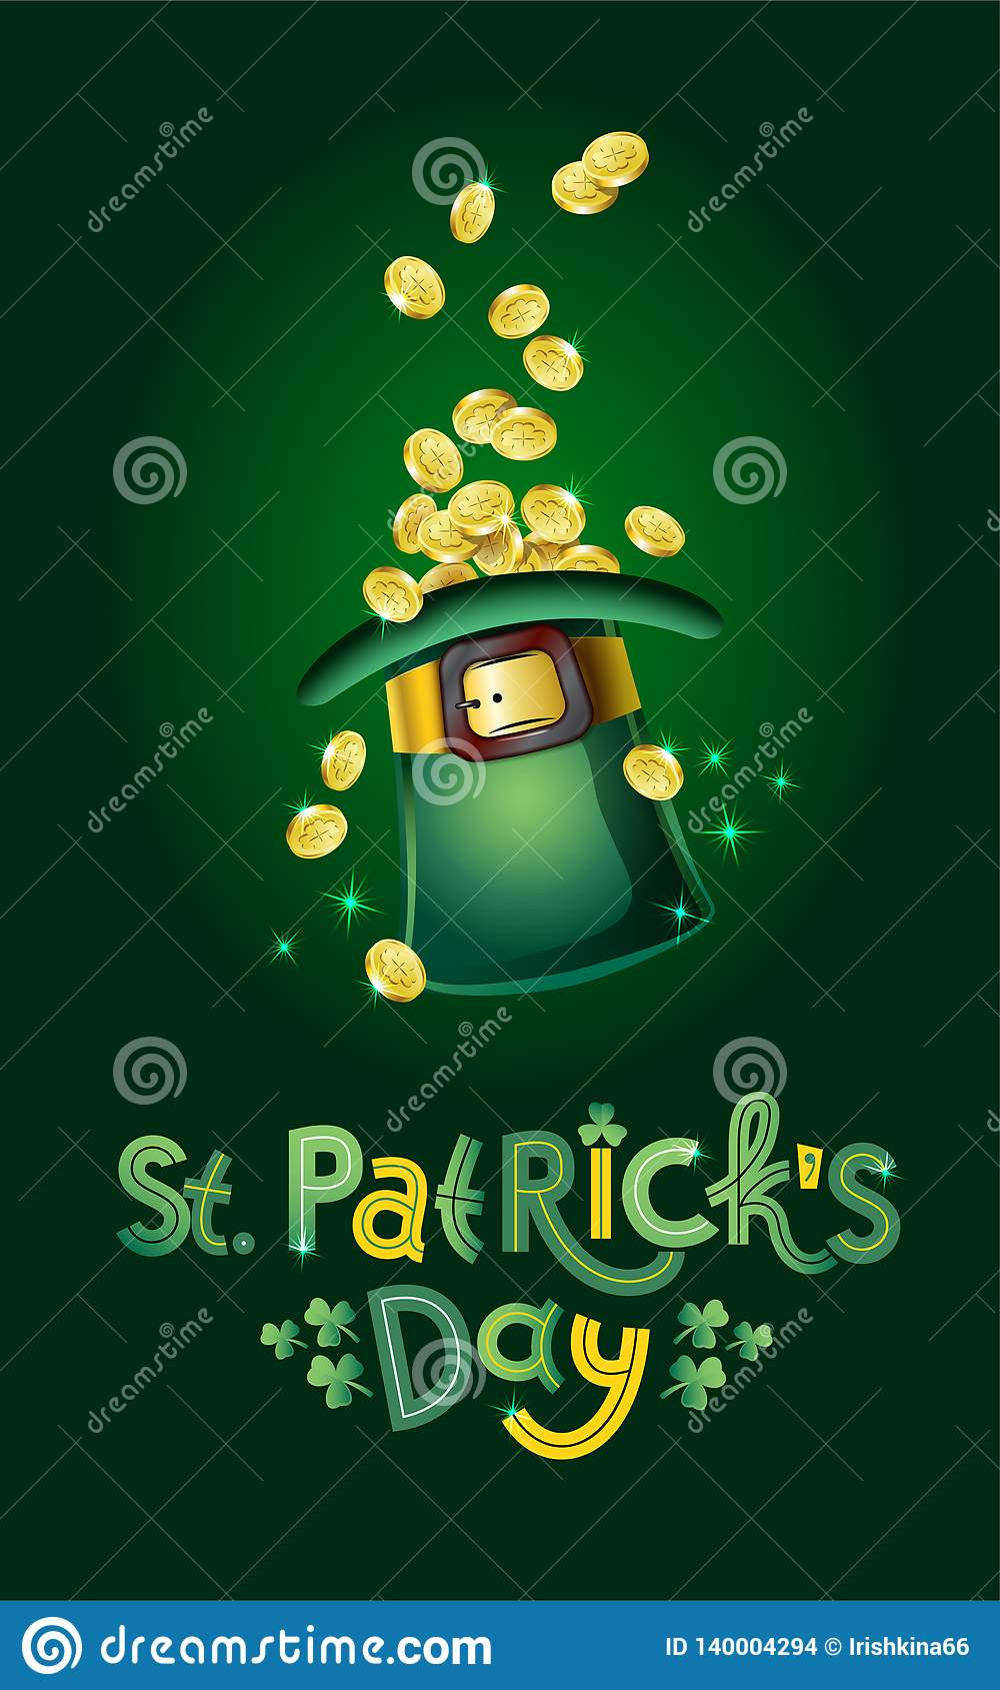 Vector Saint Patricks Day Card, hat full of golden coins, treasure of Leprechaun. Lettering text Happy St Patricks Day